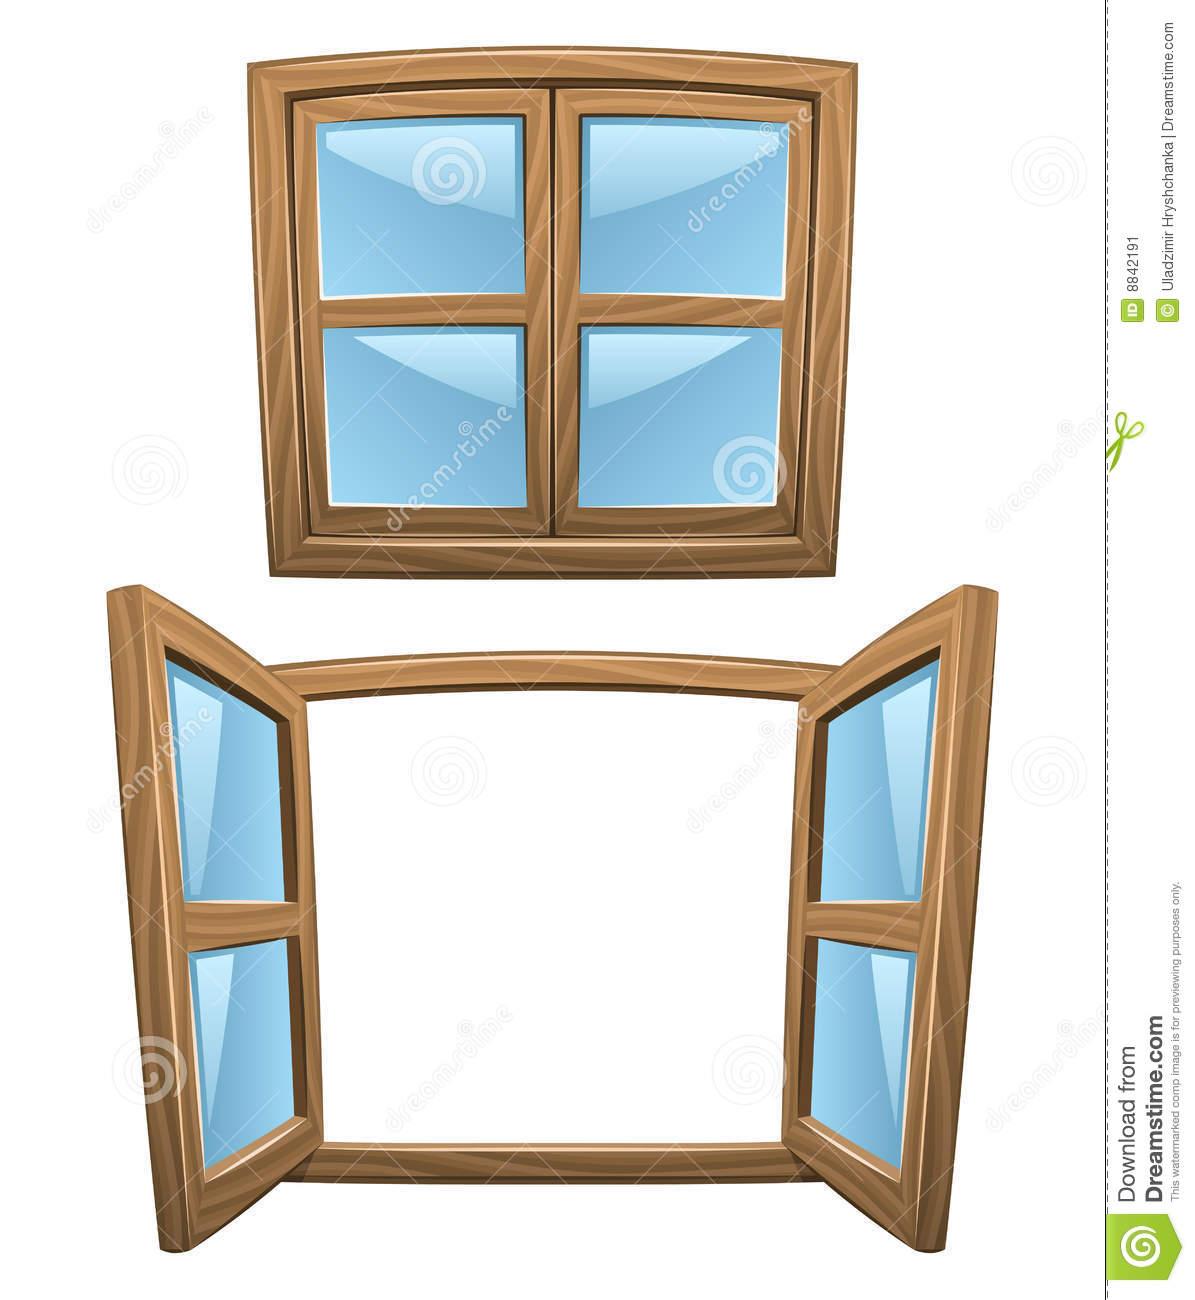 Window clipart wooden window Open Clipart Panda Clipart Clipart